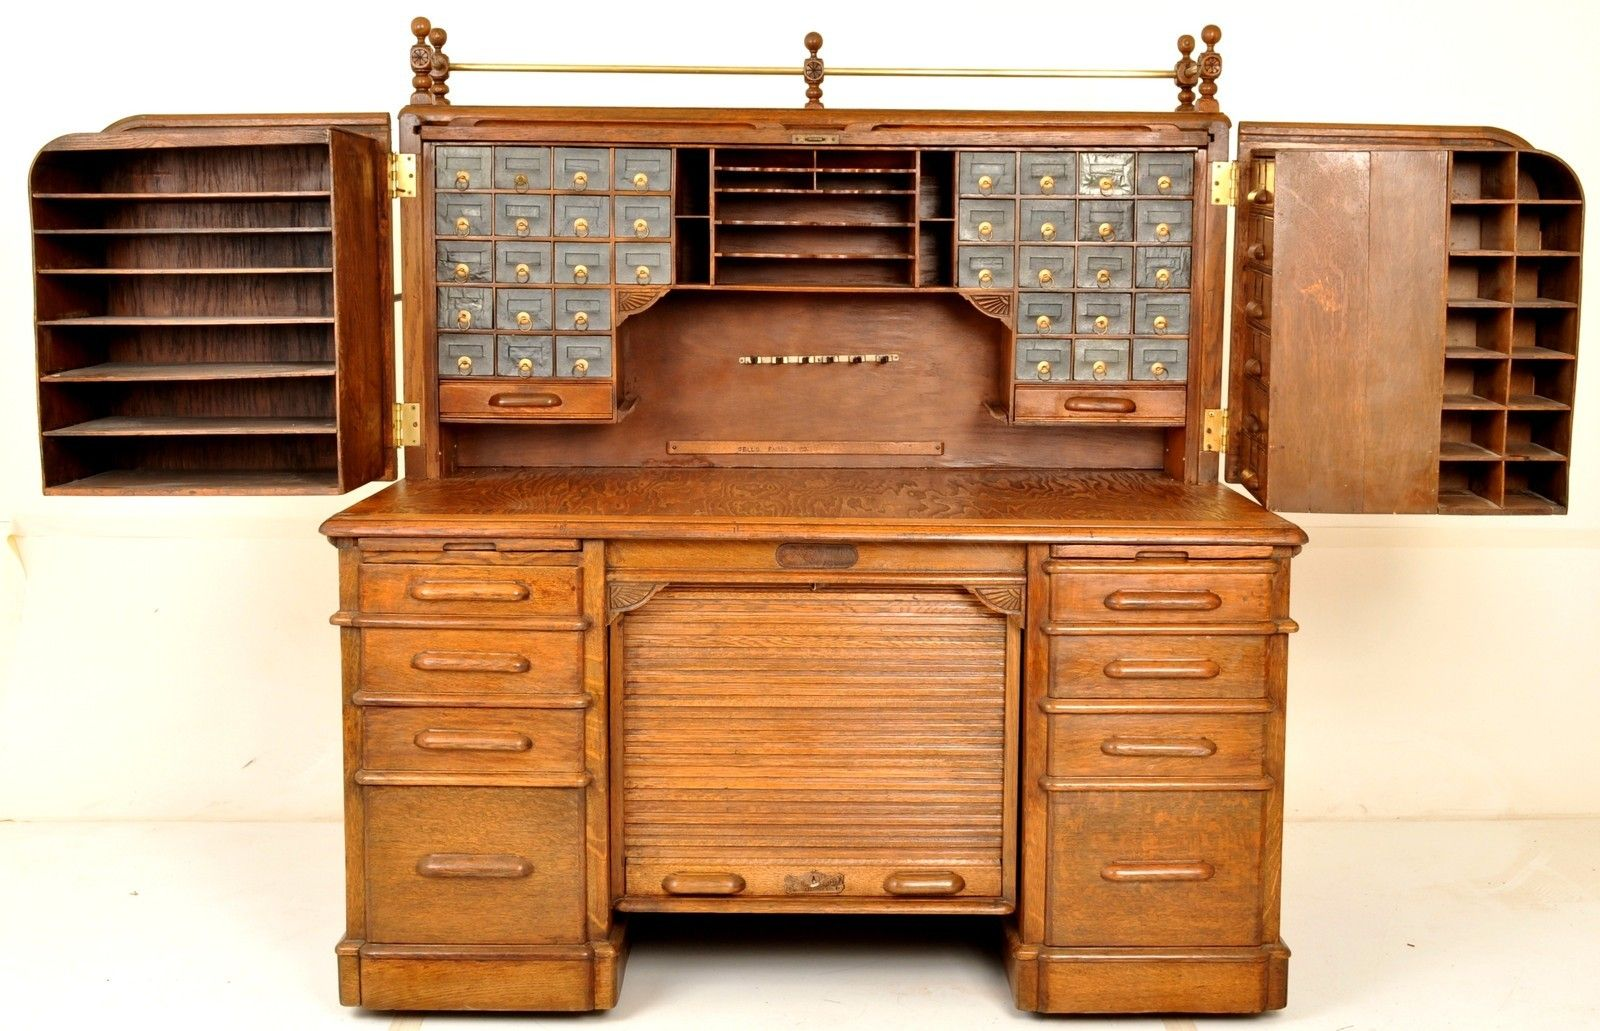 Wells Fargo Indianapolis Rotary Oak Roll Top Desk Circa 1880